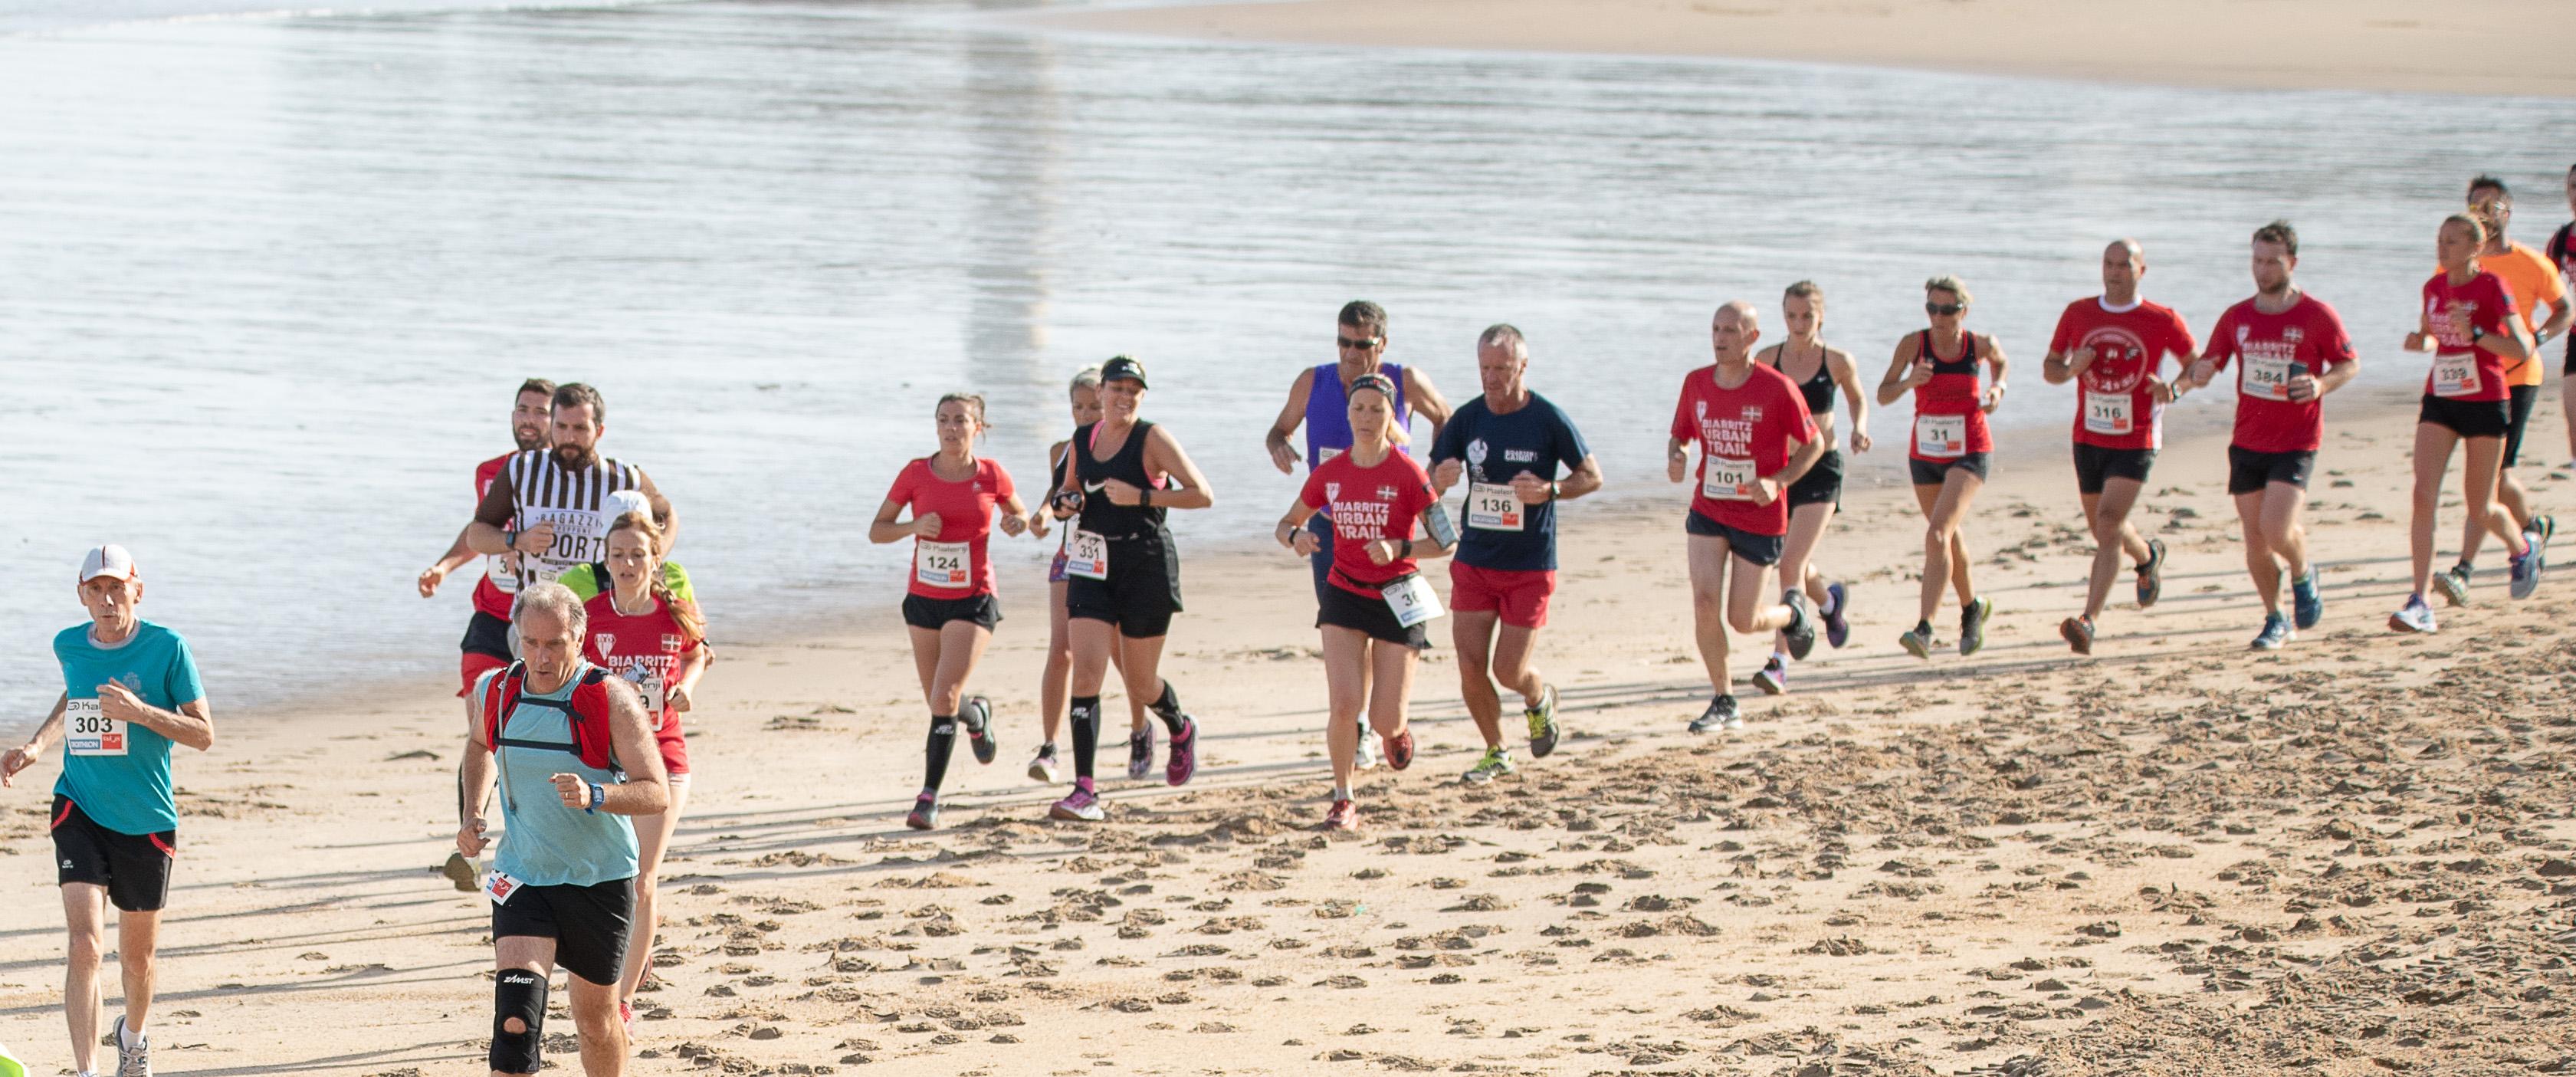 Marathon de Biarritz - Grande Plage  - 24 juin 2018_66